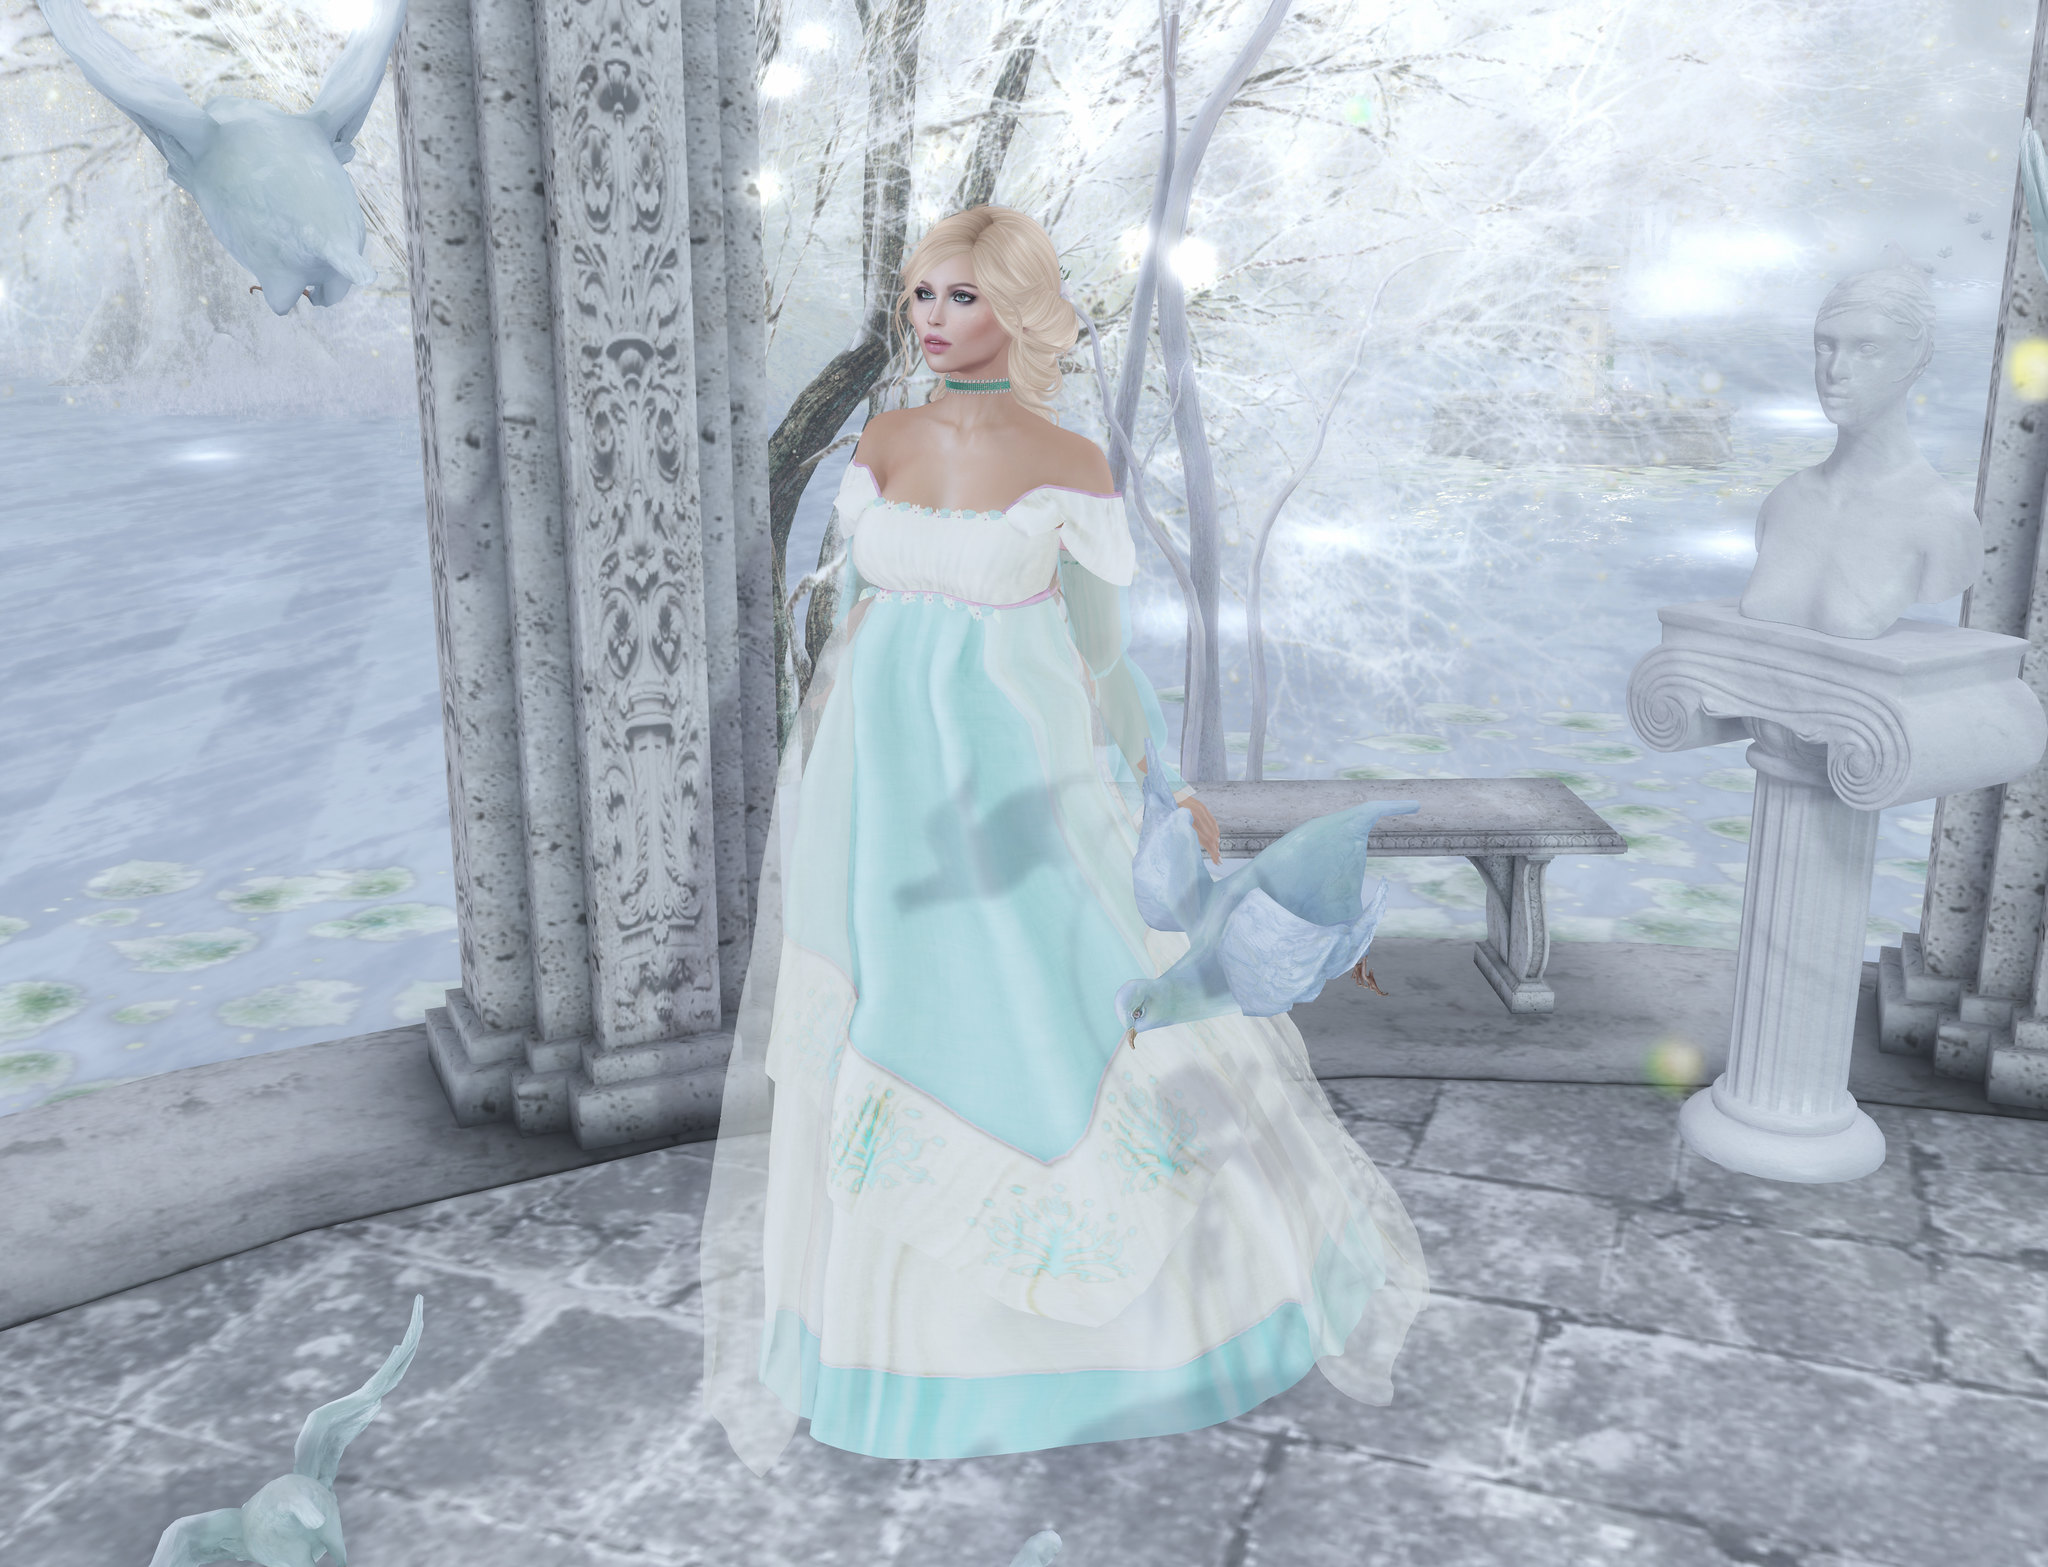 Born of Hope gown, Silvan Moon Designs @ We Love RP